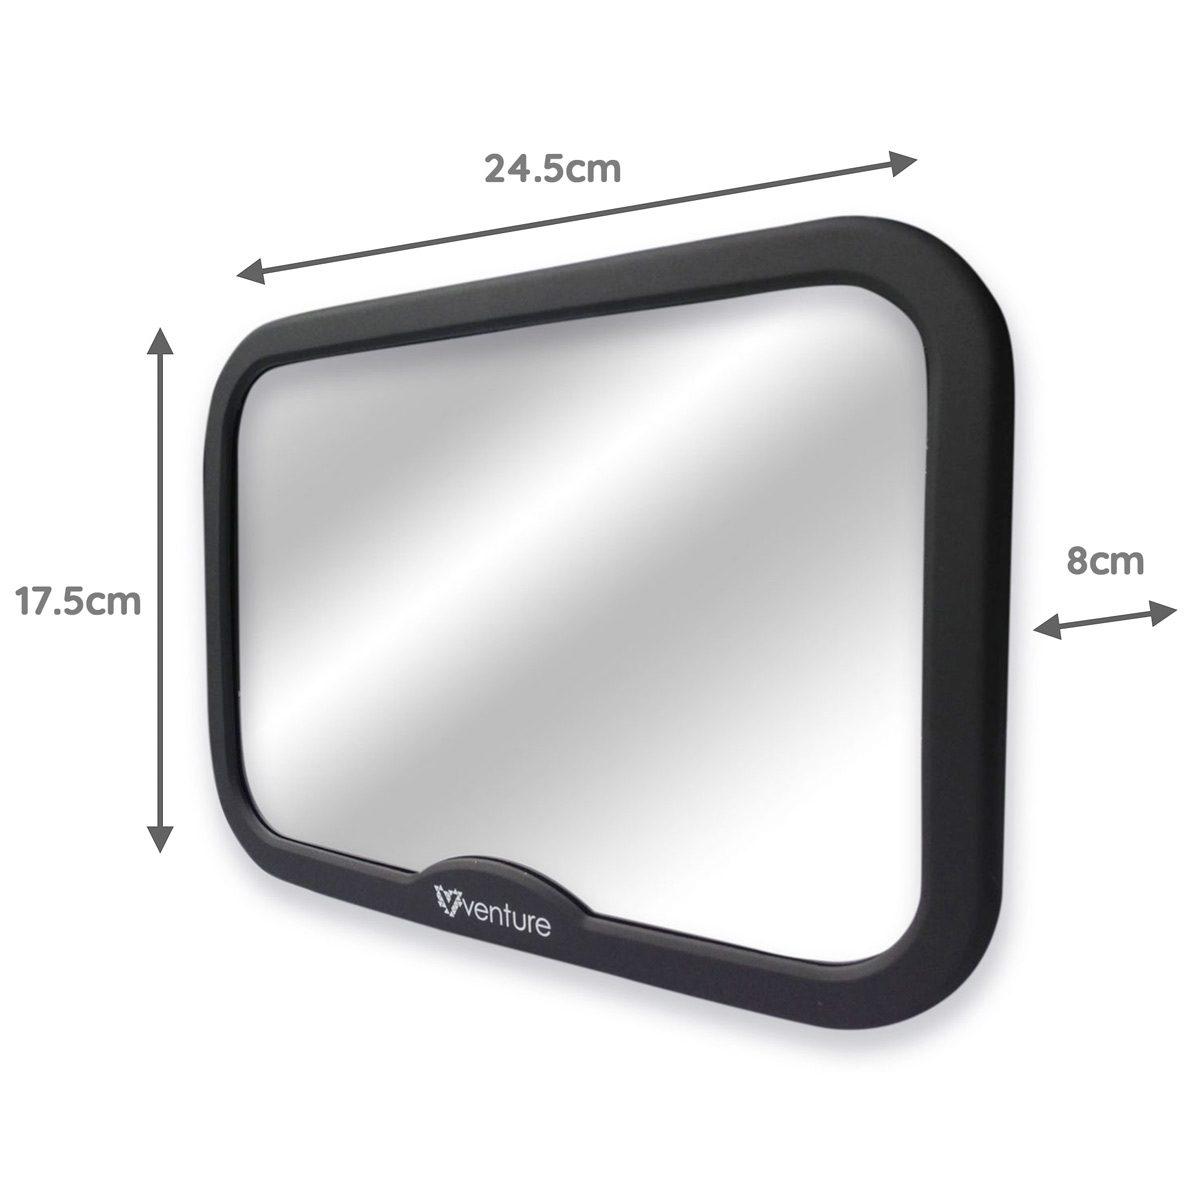 Venture Acti-Vue Car mirror dimensions